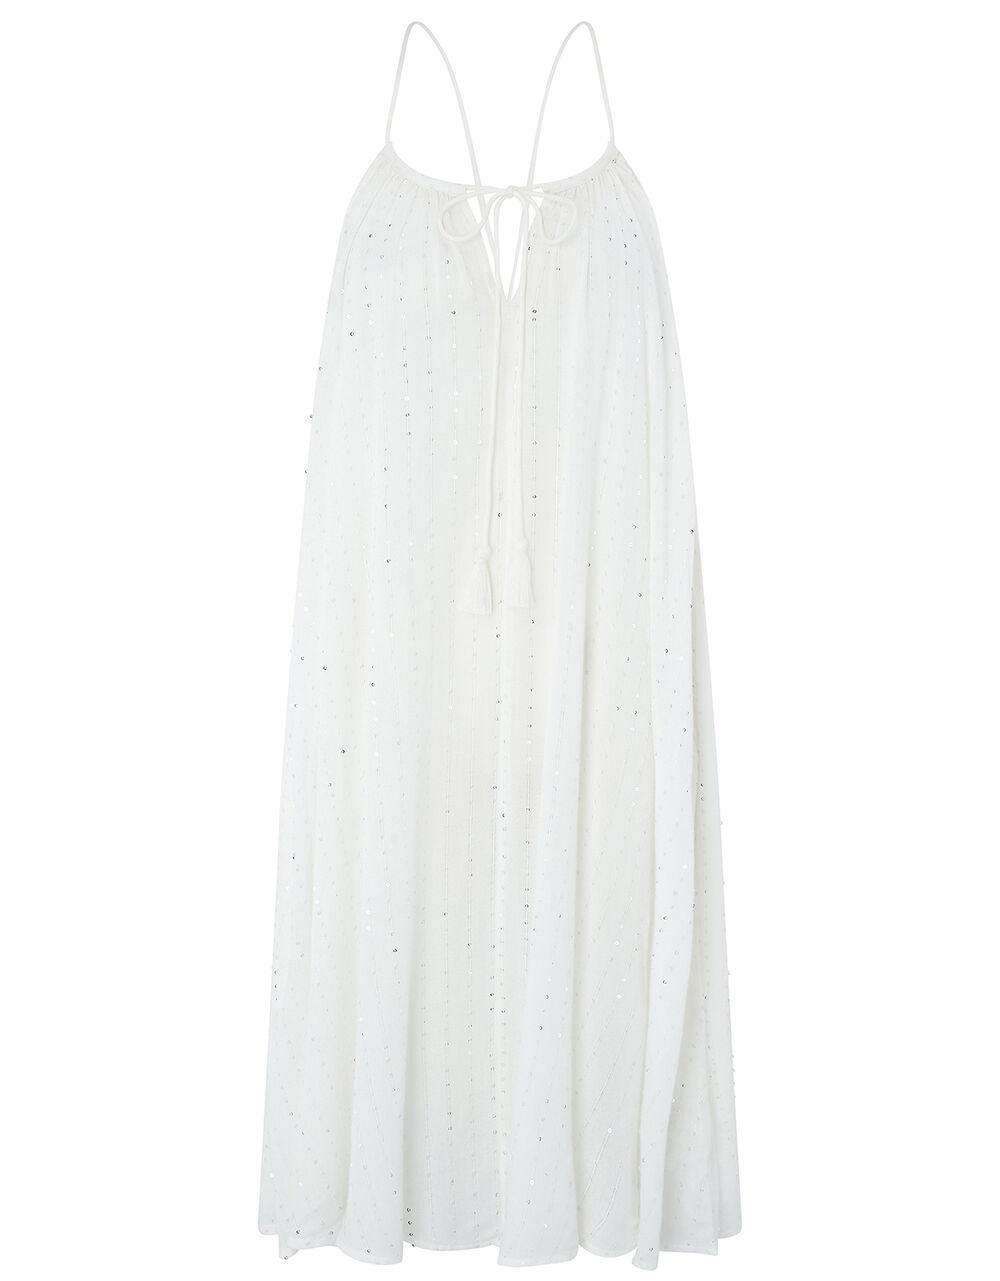 Sequin Swing Midi Dress, White (WHITE), large